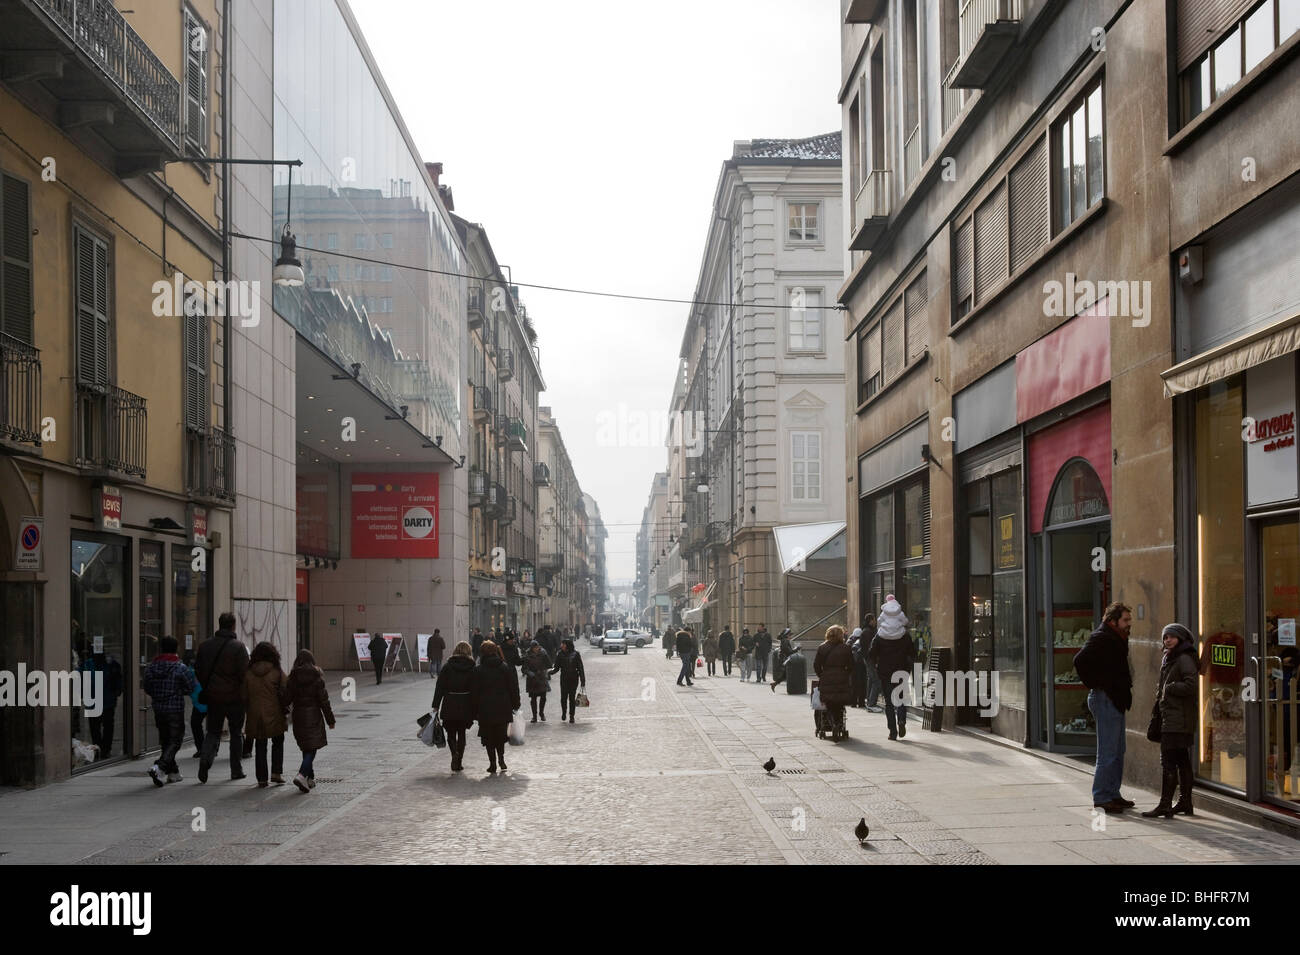 Shops on Via Lagrange in the historic centre, Turin, Piemonte, Italy - Stock Image